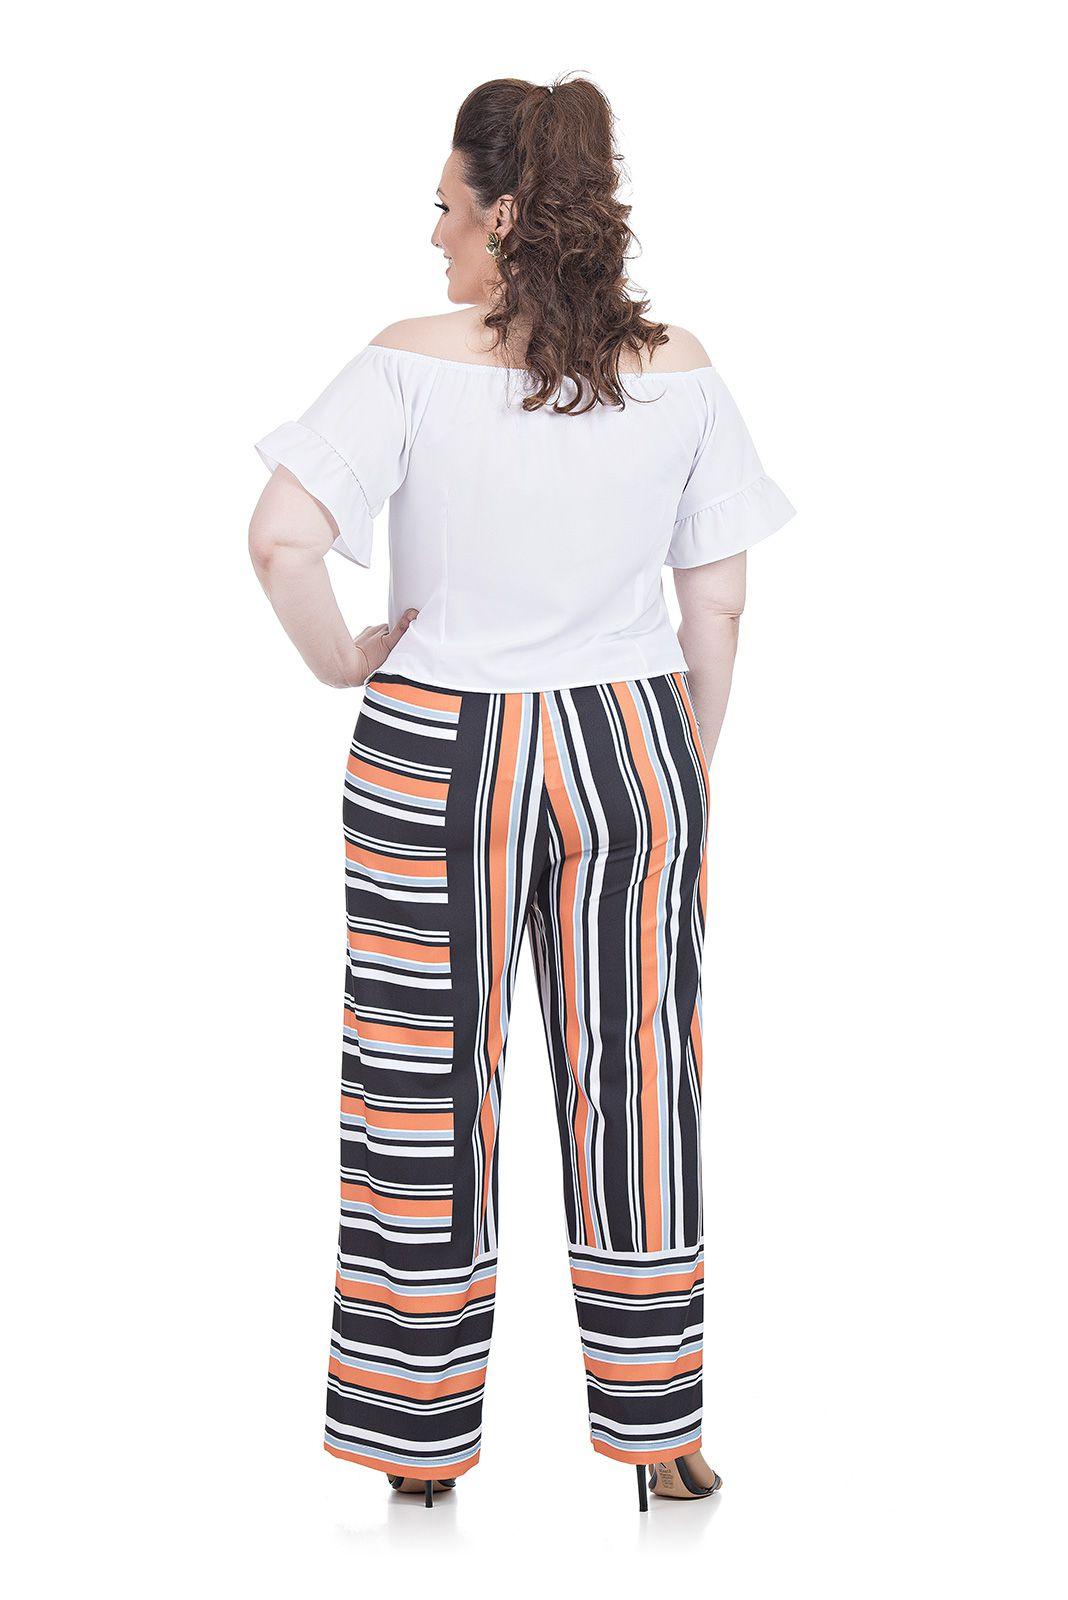 Blusa Ombro a Ombro Plus Size